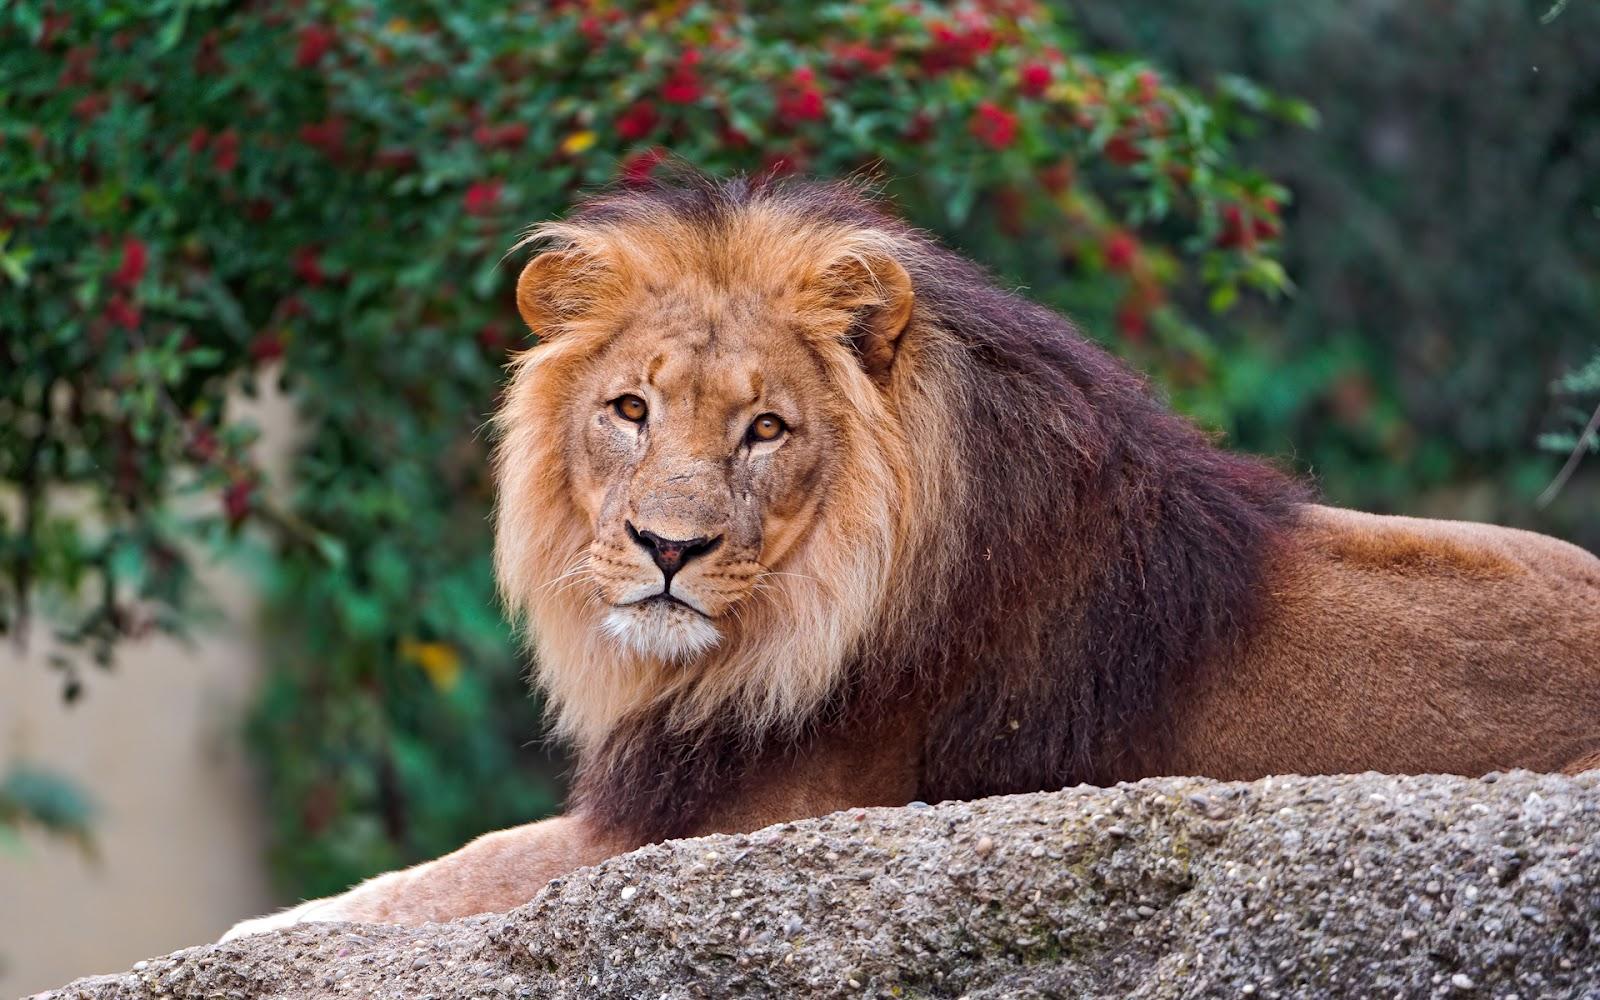 http://1.bp.blogspot.com/-oiVGF-gdhvQ/T8ZiQ-KTZ7I/AAAAAAAAeW4/oATV1UnbTcc/s1600/Leon_Imagenes-de-Animales-en-HD.jpg